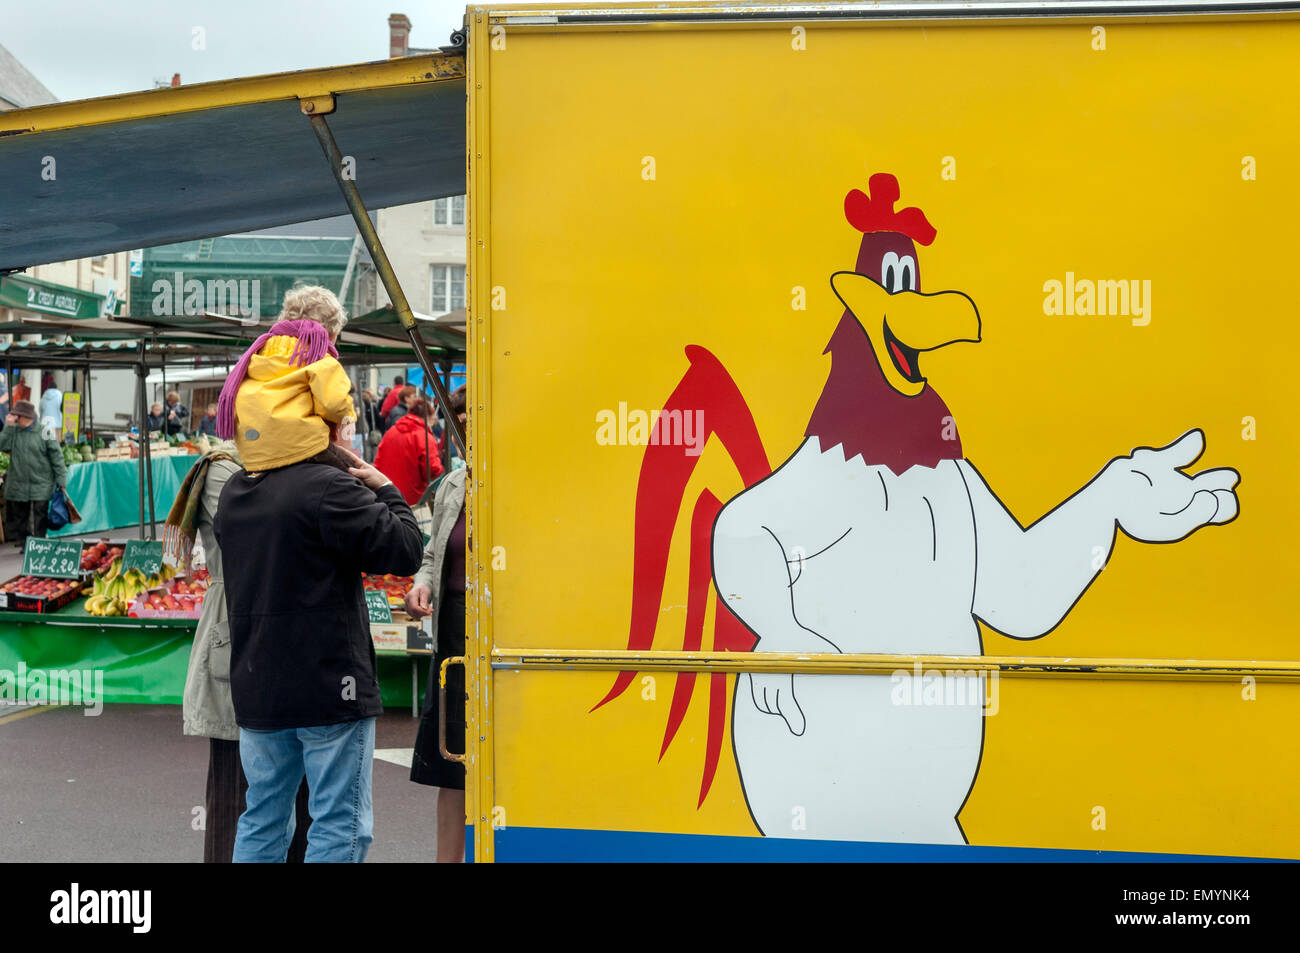 Día de mercado en Barneville-Carteret. La península de Cotentin. Manche. Normandía. Francia Foto de stock